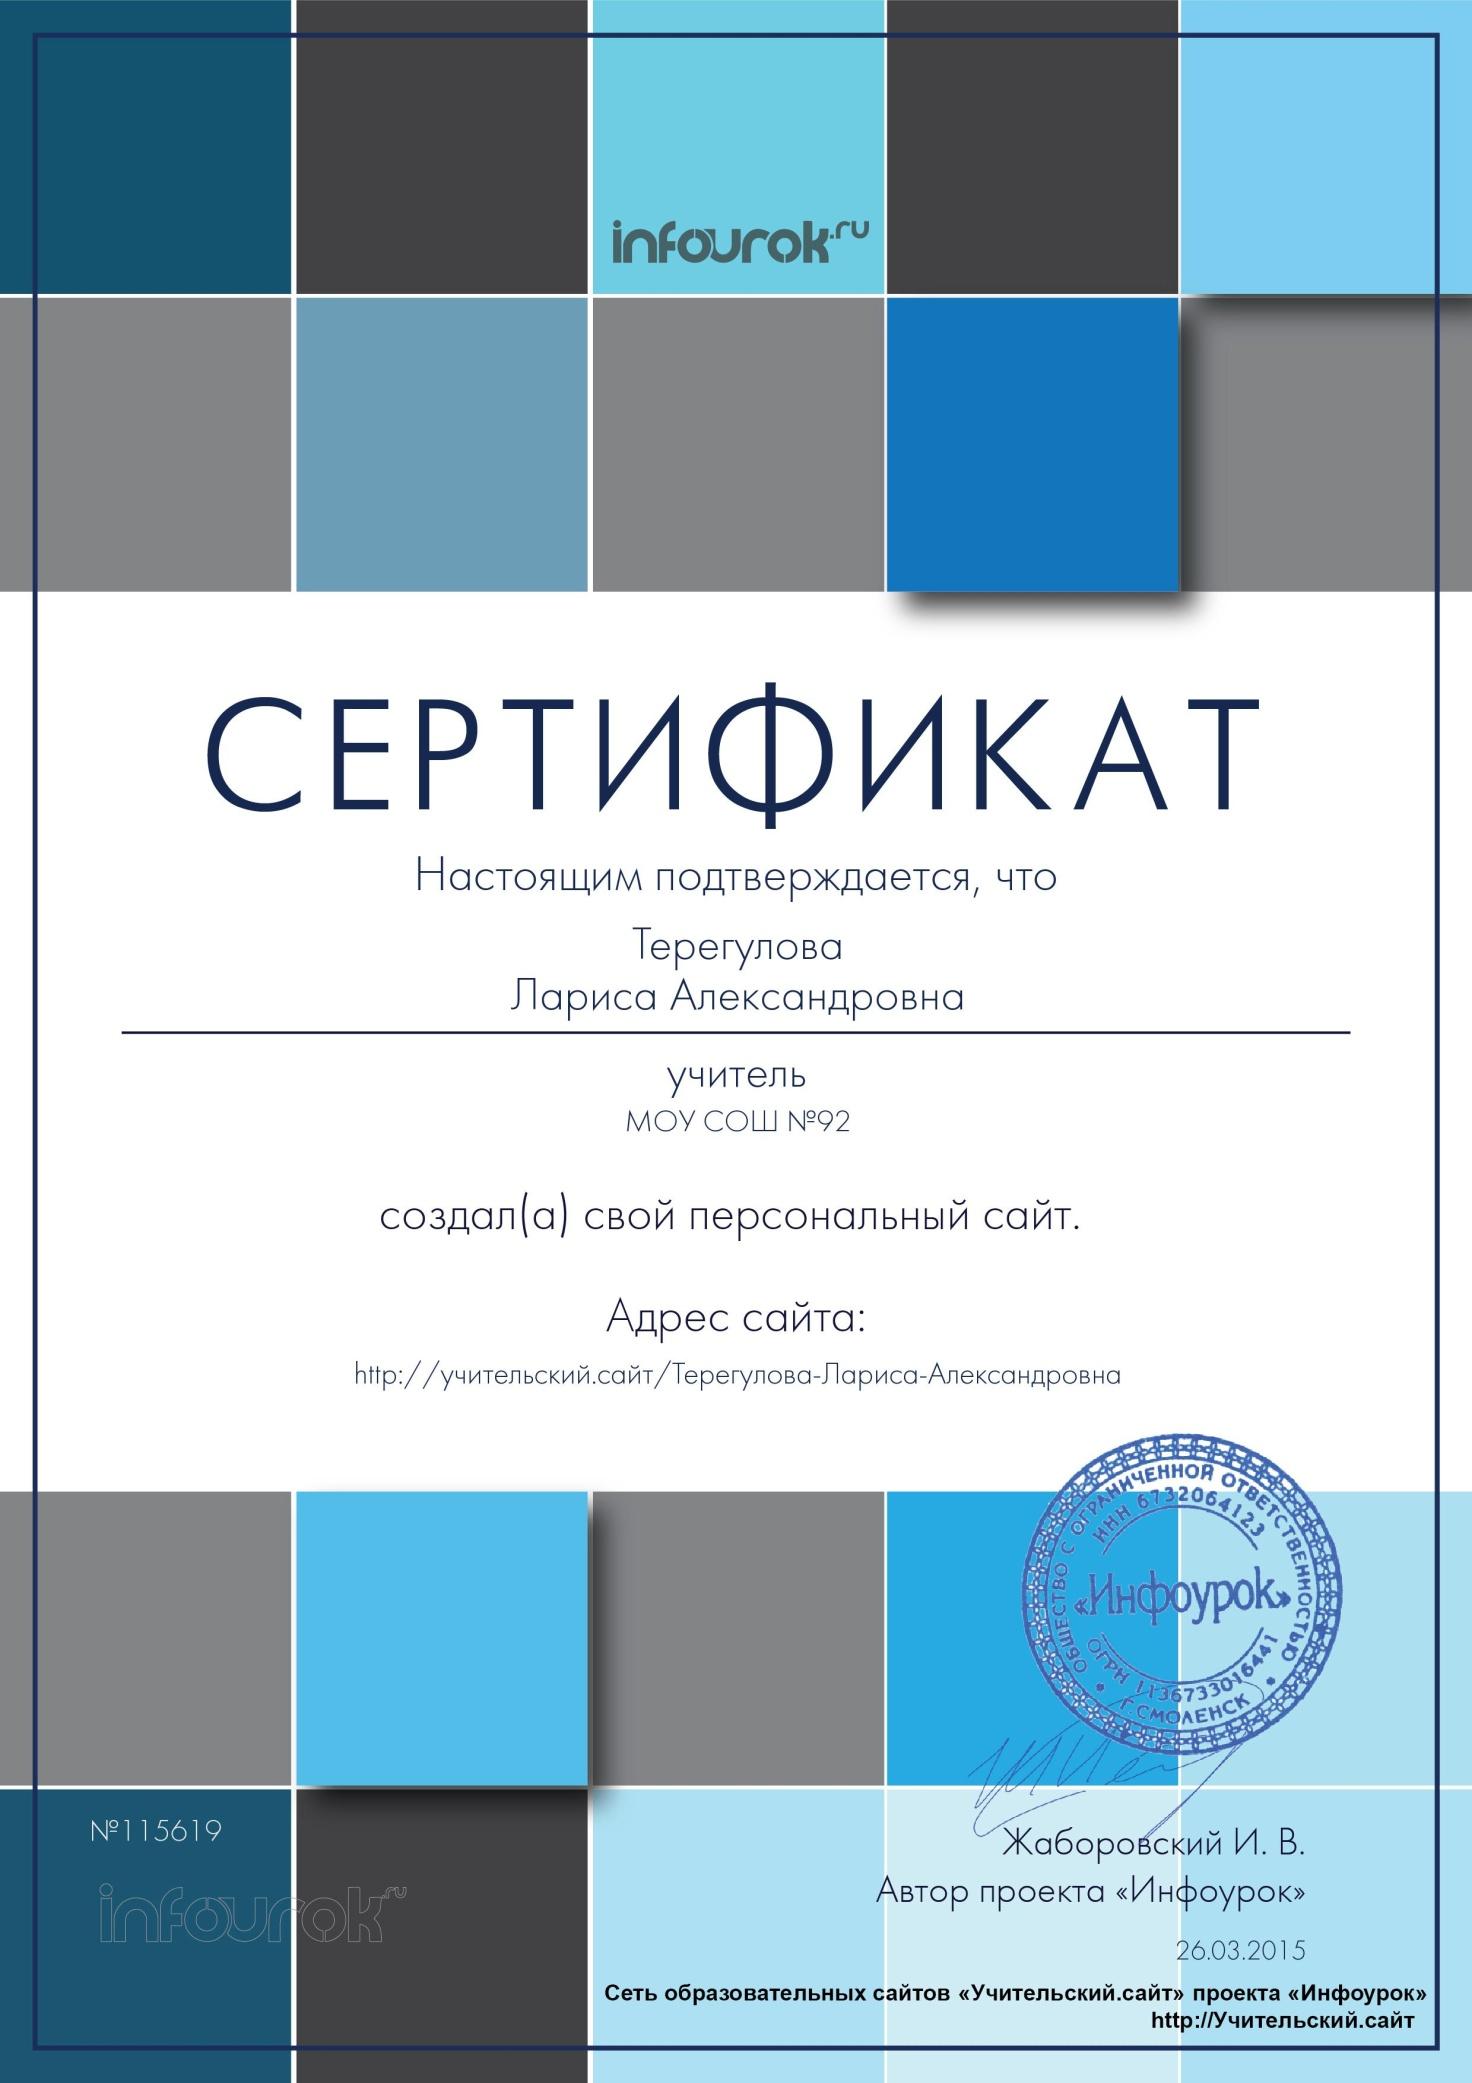 format_A4_document_201897.jpg